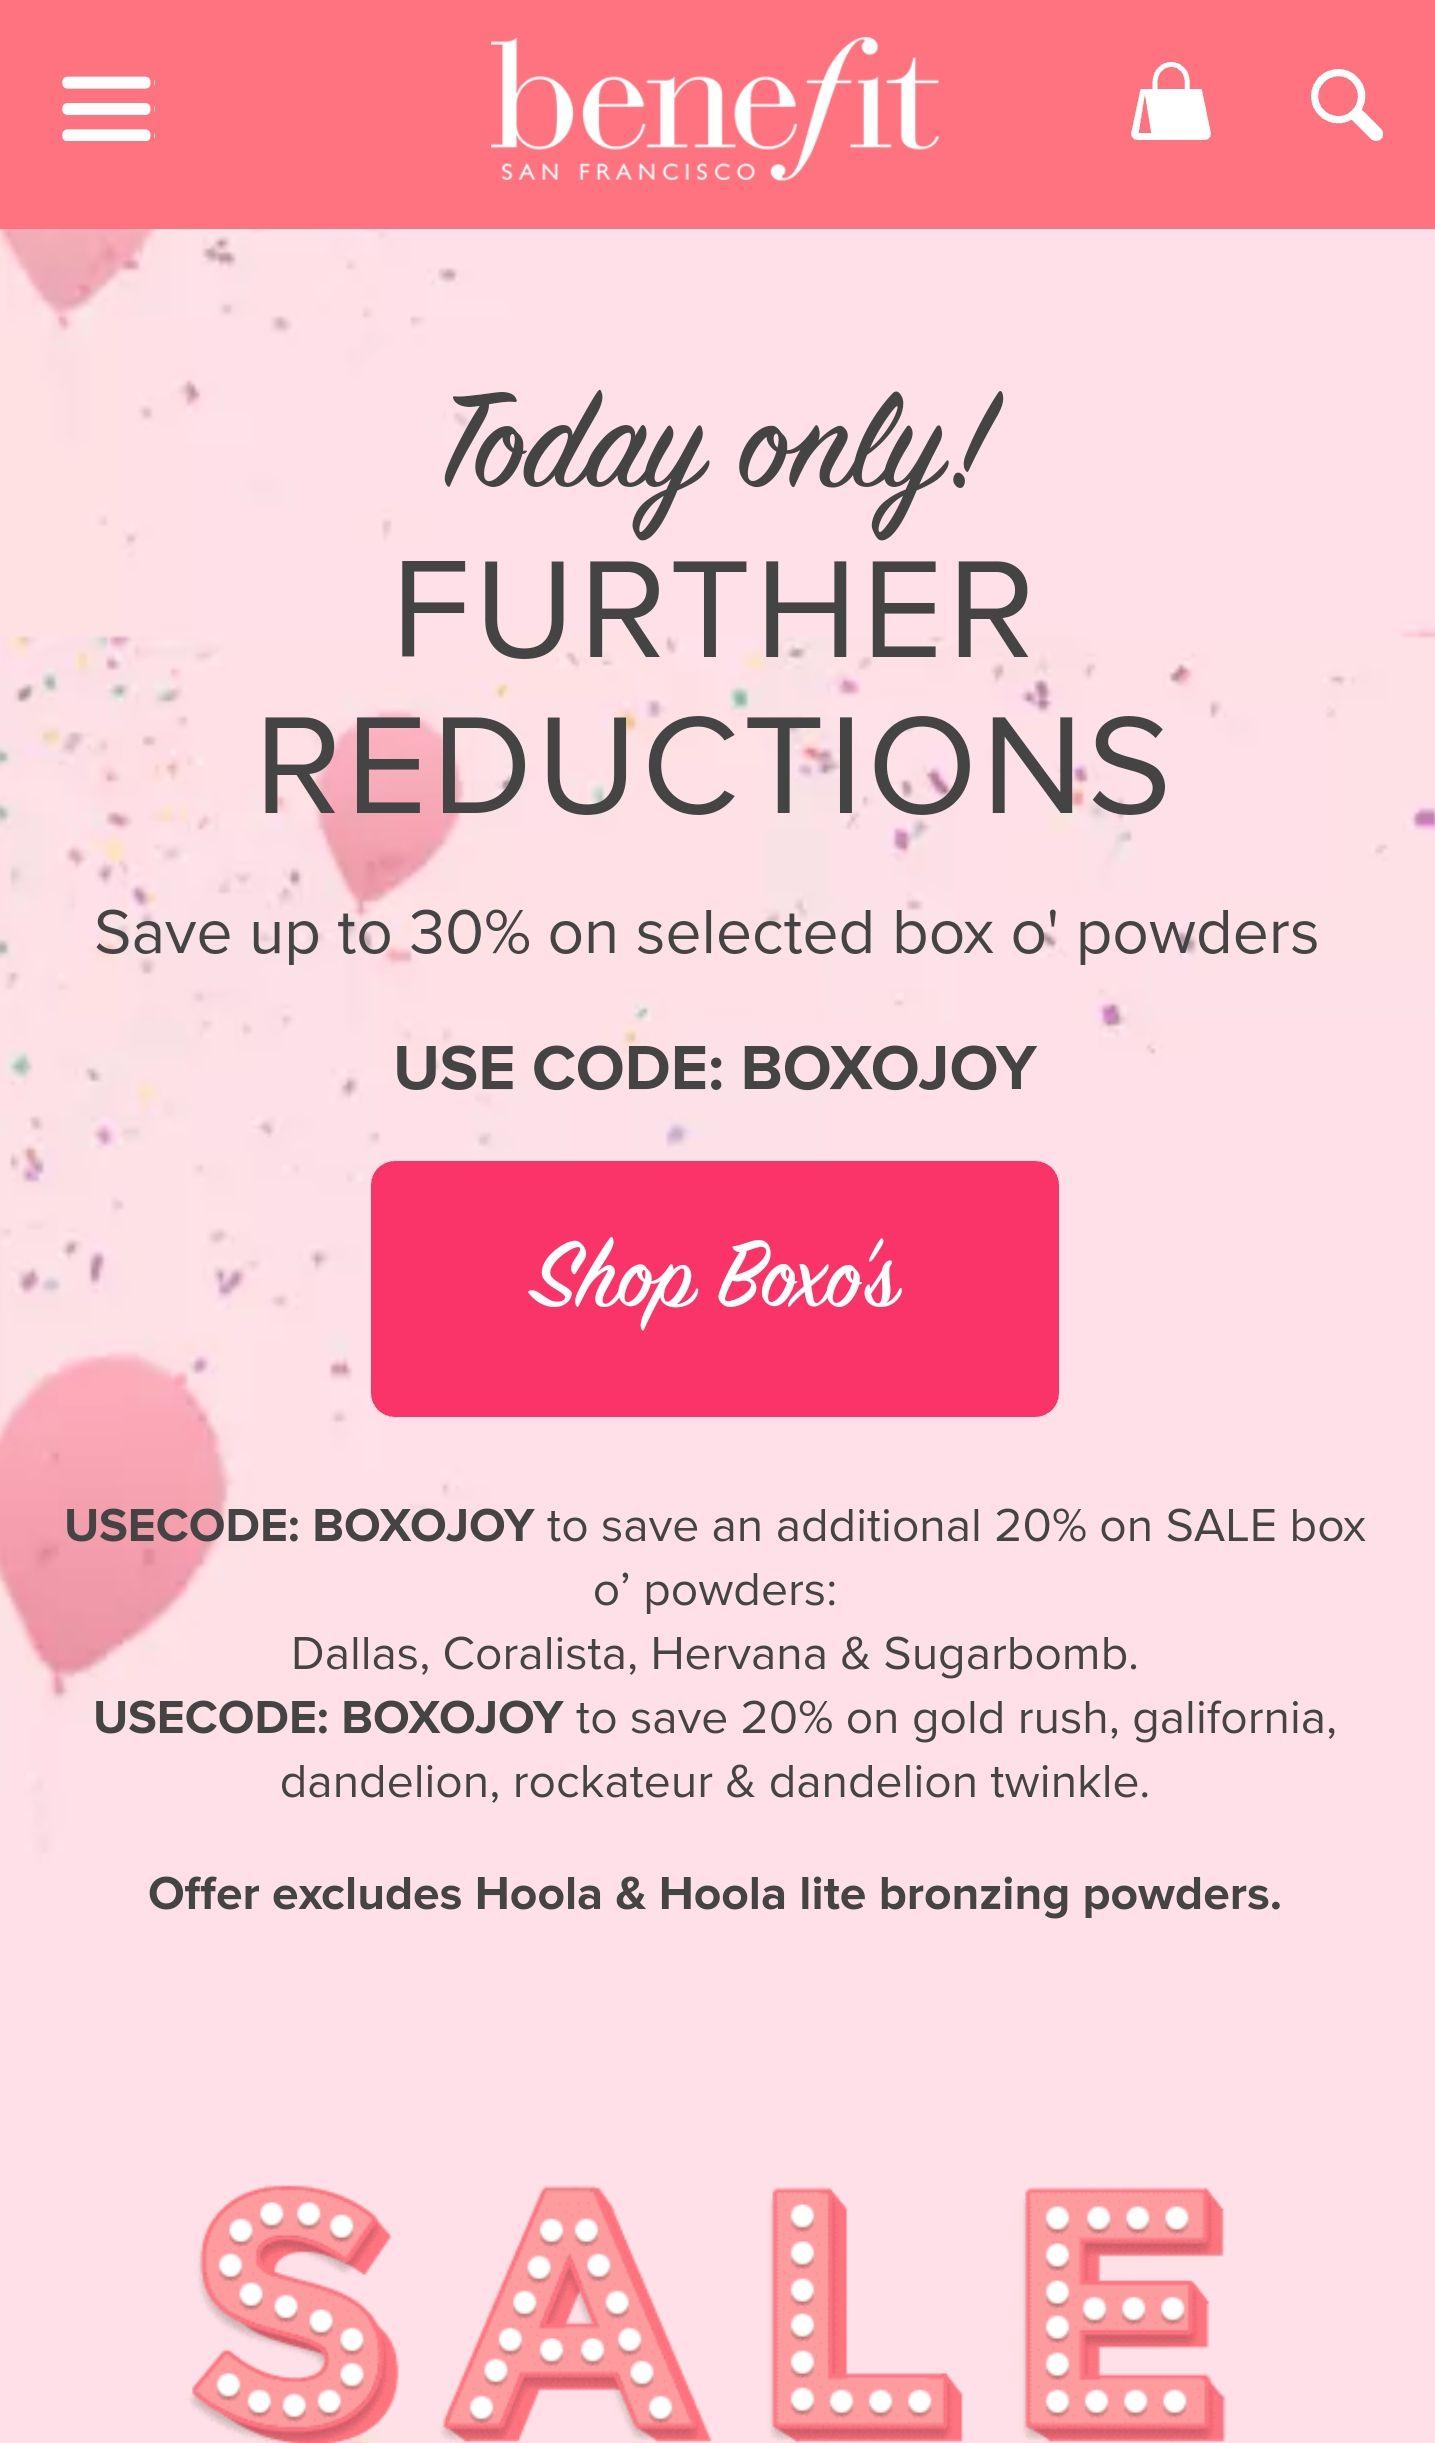 Benefit Cosmetics - Save 30% on Box O' Powders